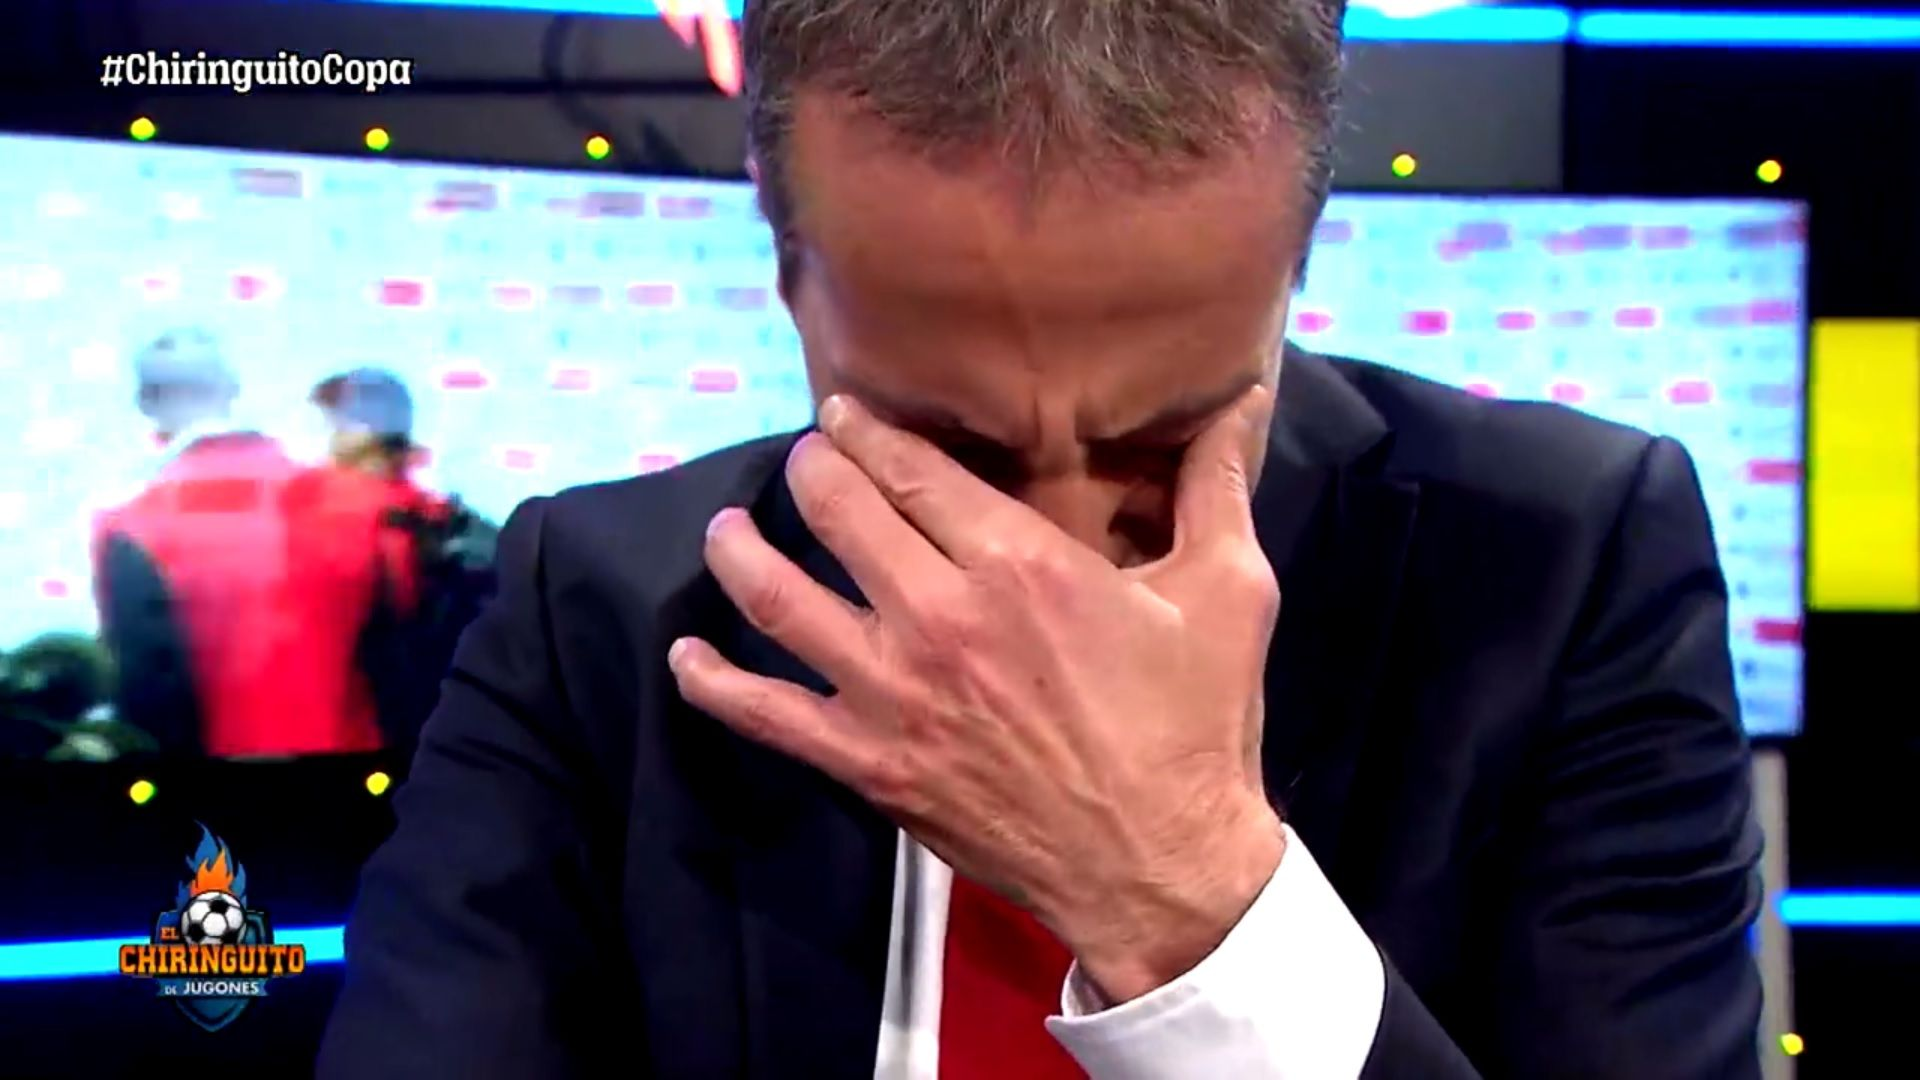 Copa del Rey: un periodista se largó a llorar en vivo tras la derrota del Sevilla ante Barcelona